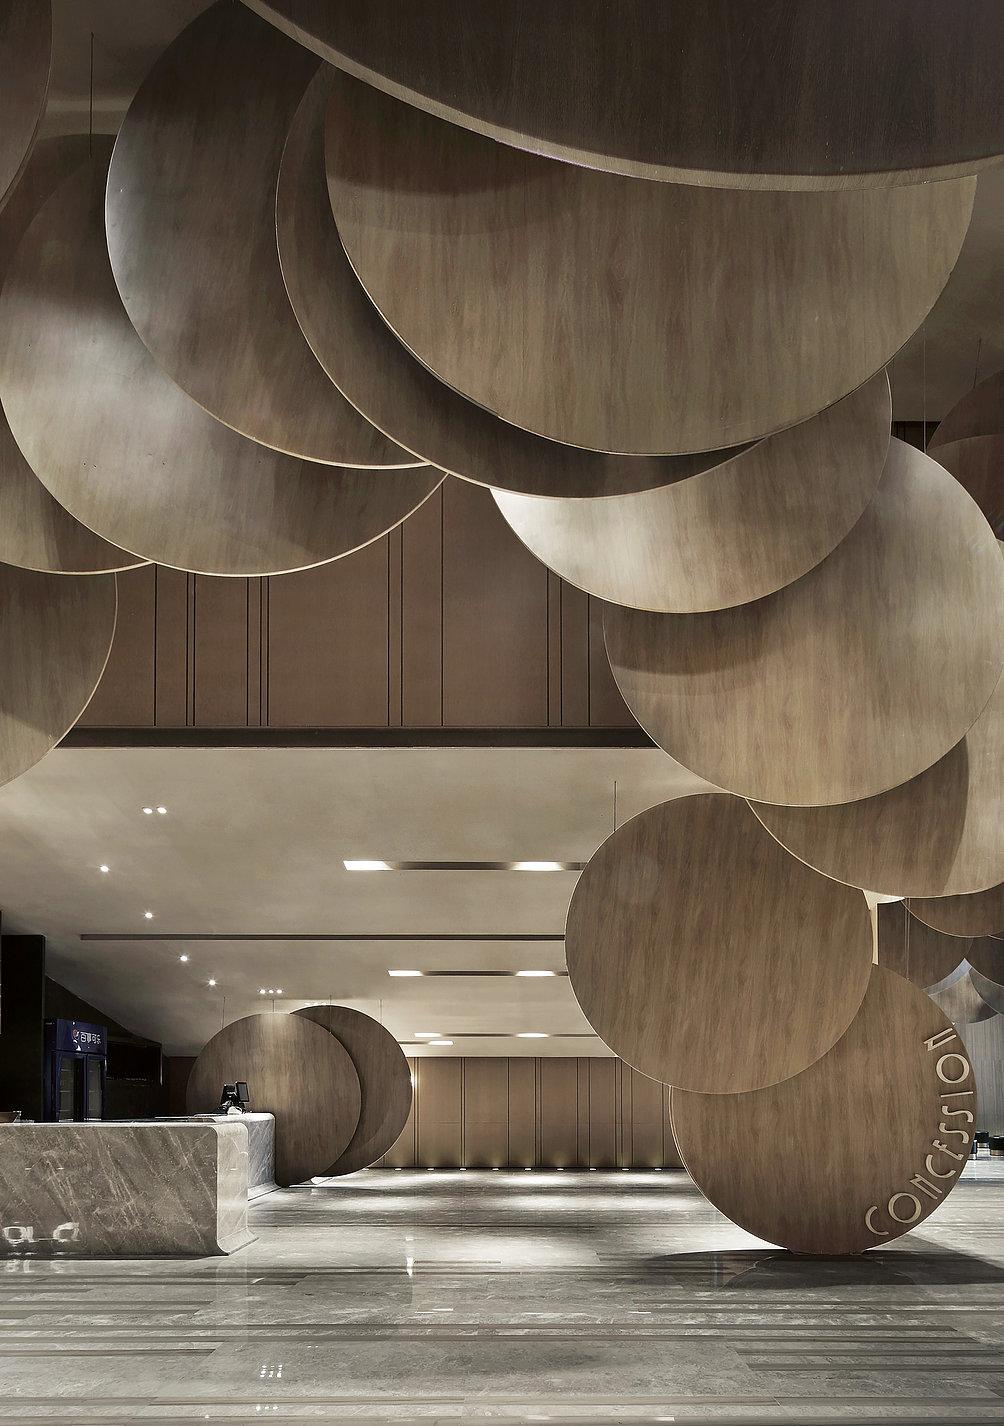 Wuhan Wushang Mall Cinema 9F | Red Dot Design Award